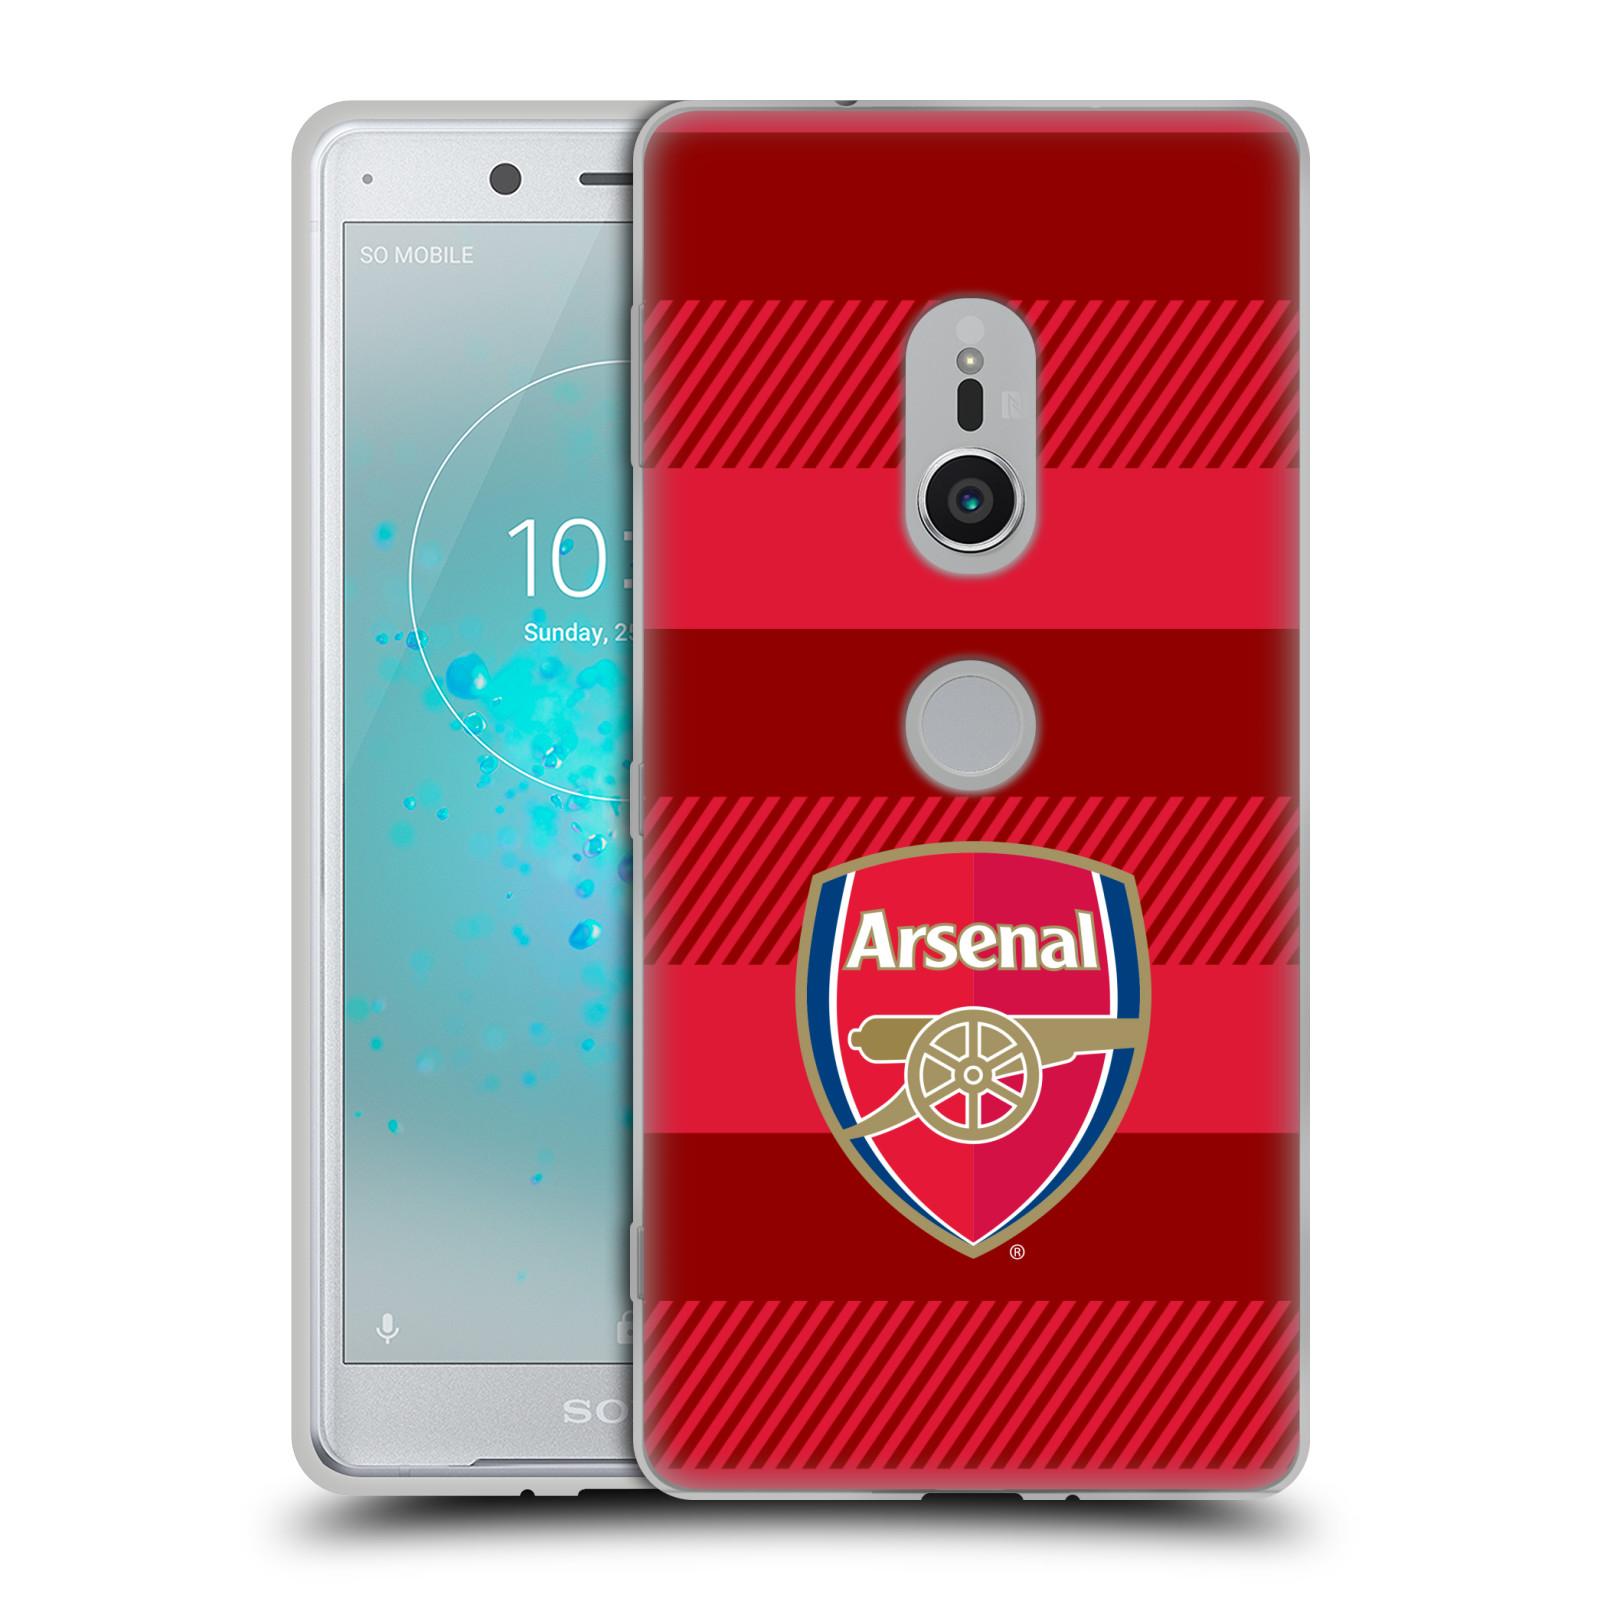 Silikonové pouzdro na mobil Sony Xperia XZ2 - Head Case - Arsenal FC - Logo s pruhy